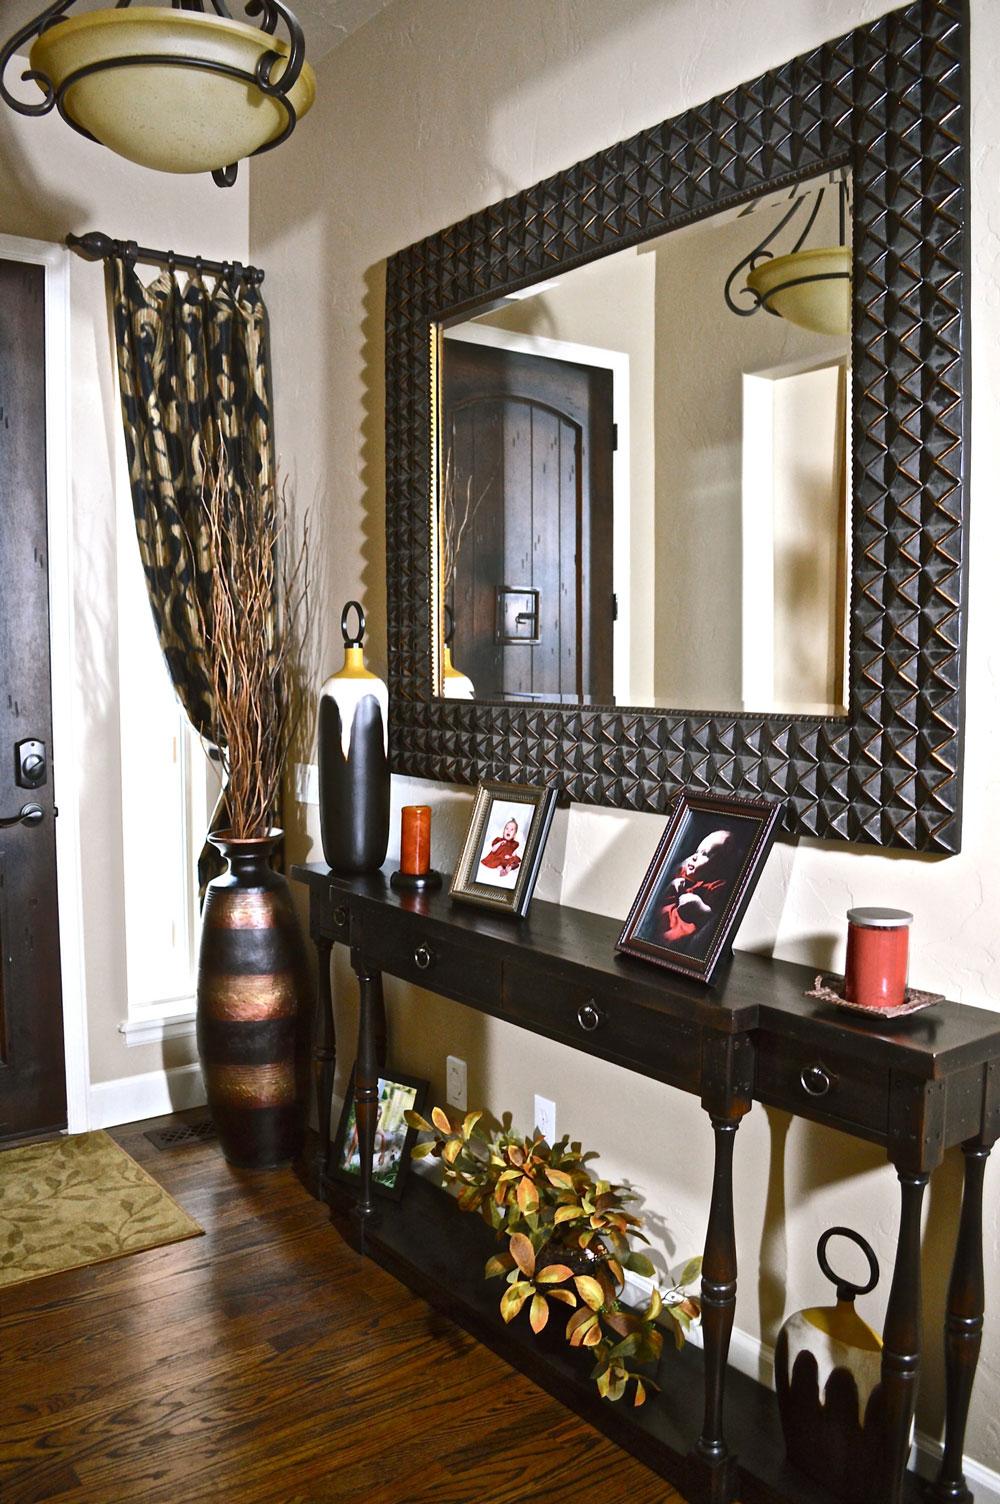 Furniture, Accessories, Drapery added